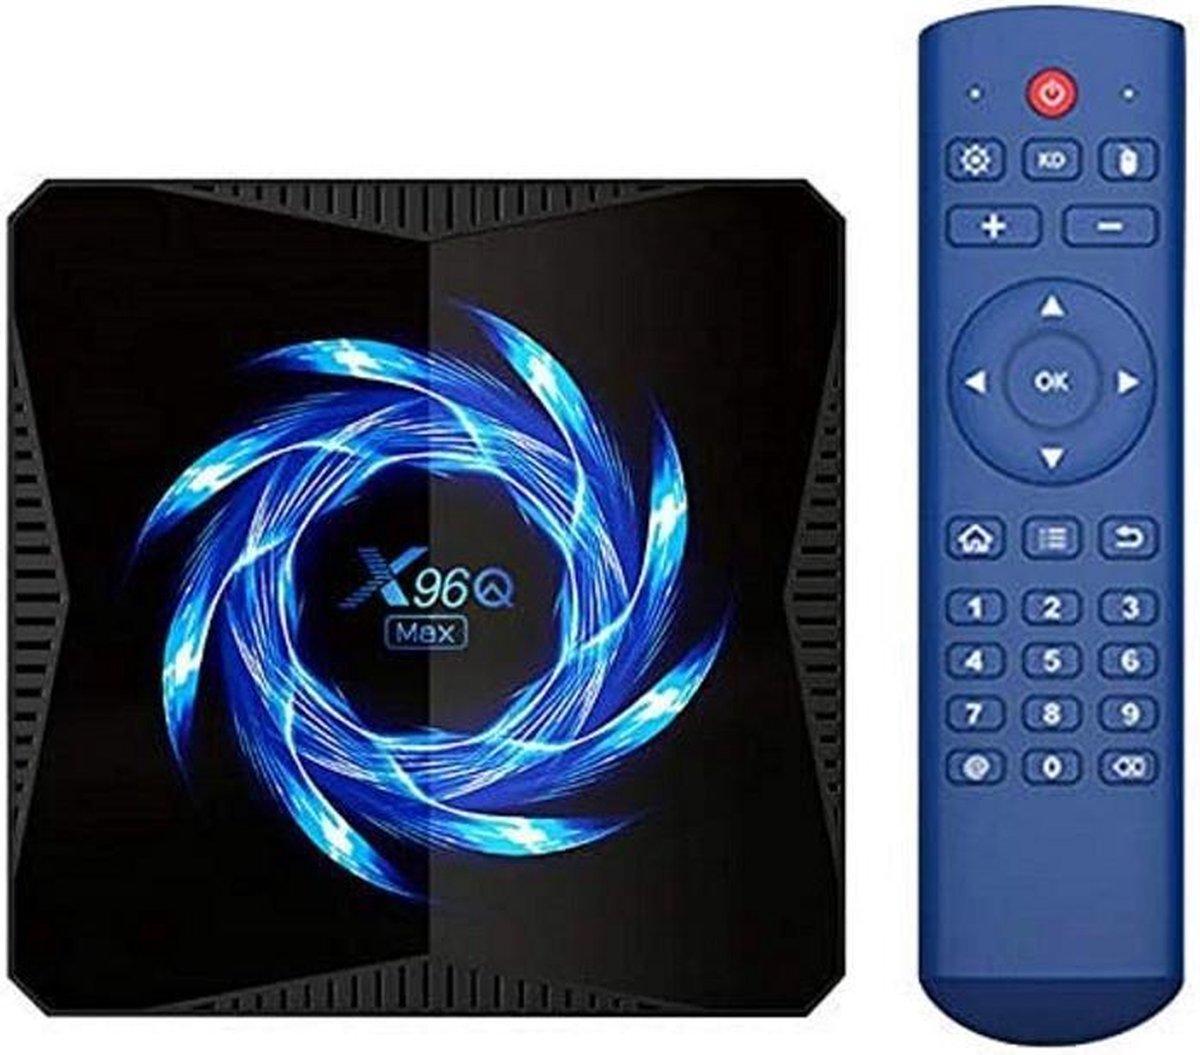 TECHPUNT X96Q Max 64GB – 2.4G 5g Dual WiFi Bluetooth 4K Media Player Android TV Box